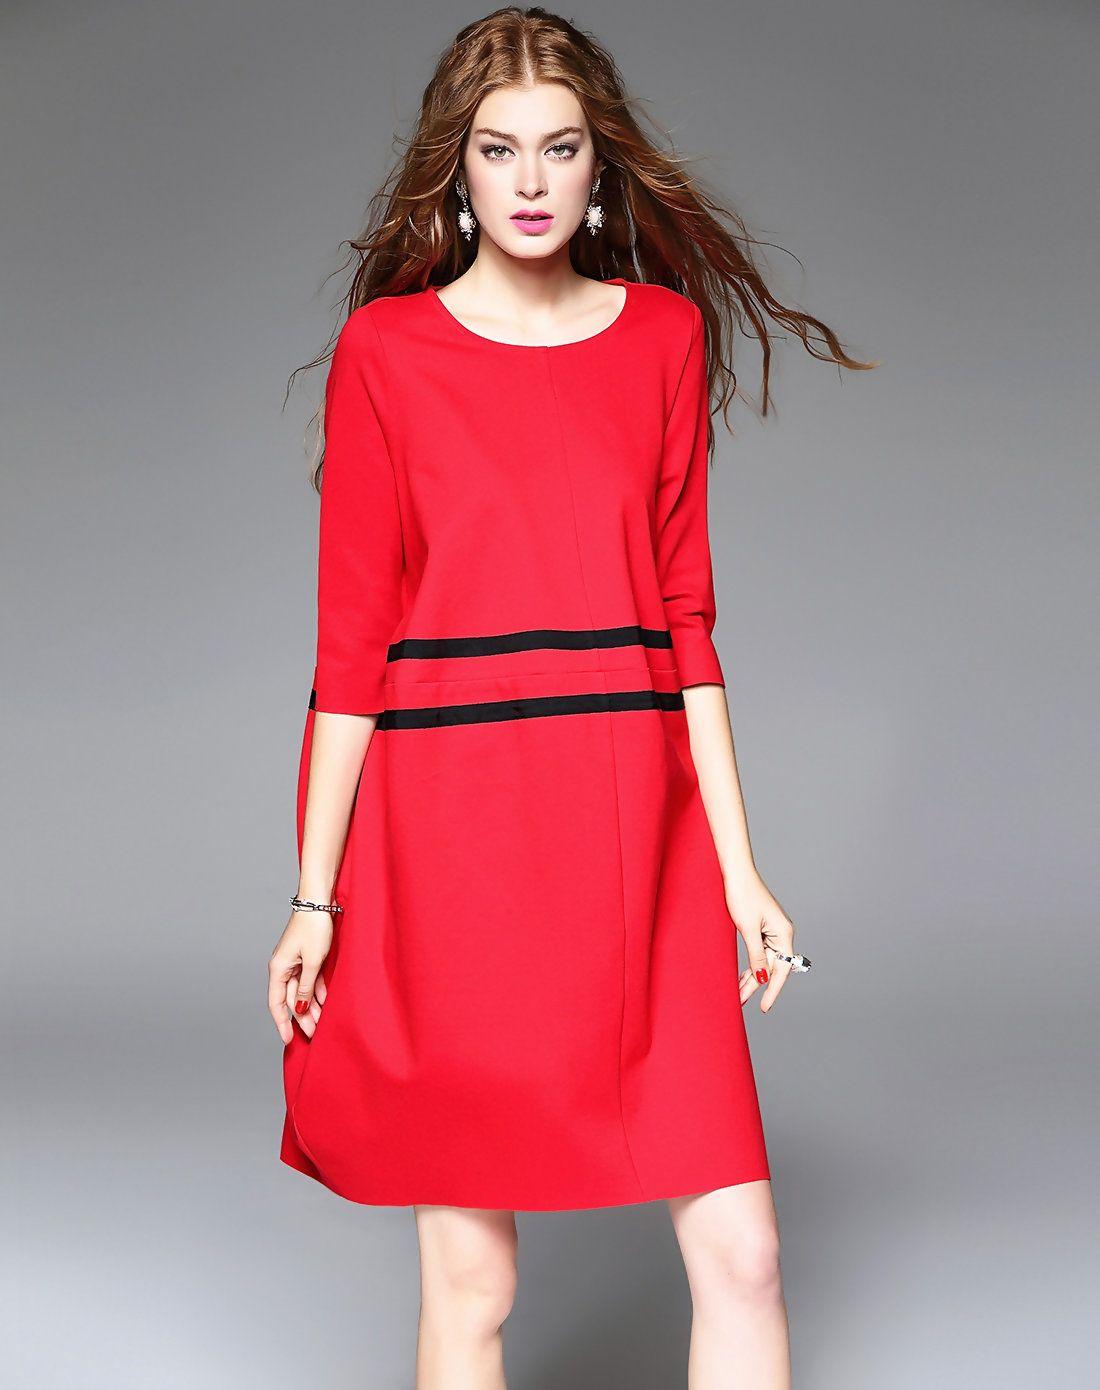 Adorewe mojaser red round neck 34 sleeves stripes midi